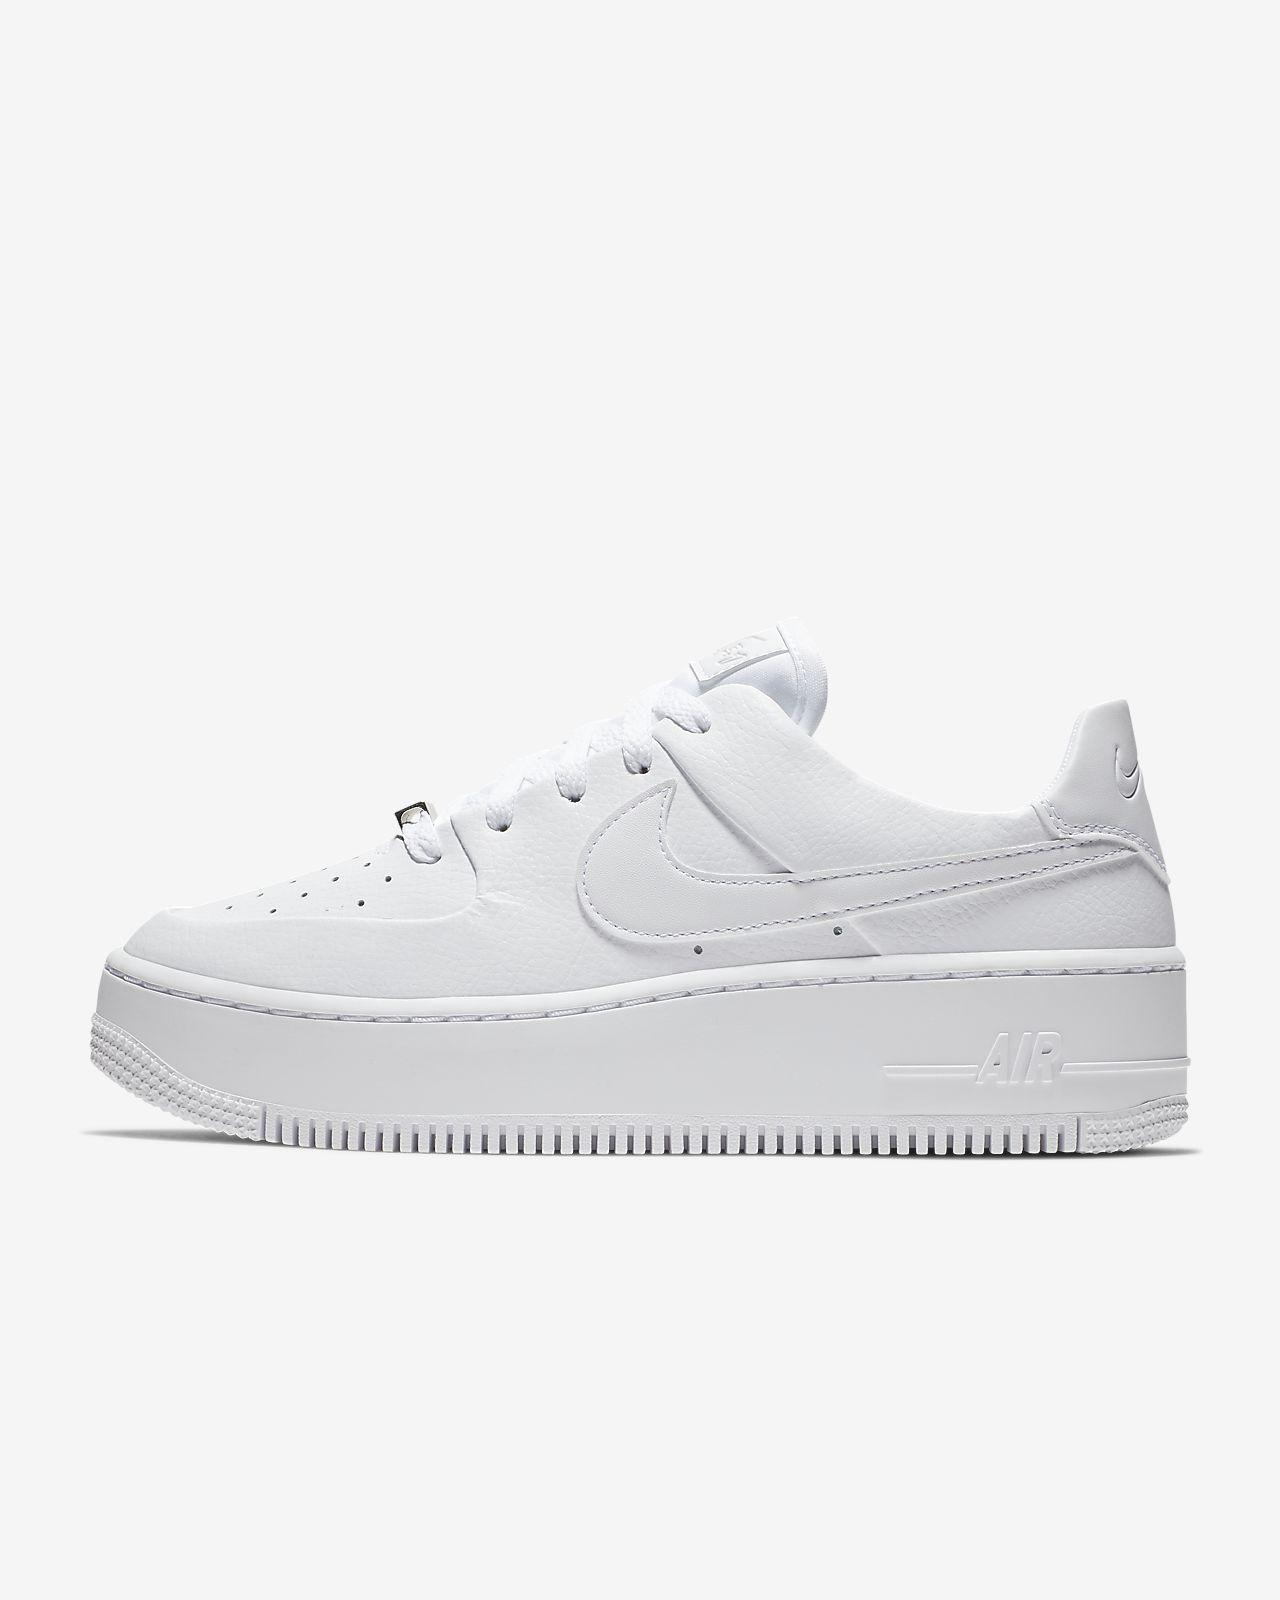 Nike air force 1 white Mid Nike Air Force Sage Low Nike Nike Air Force Sage Low Womens Shoe Nikecom